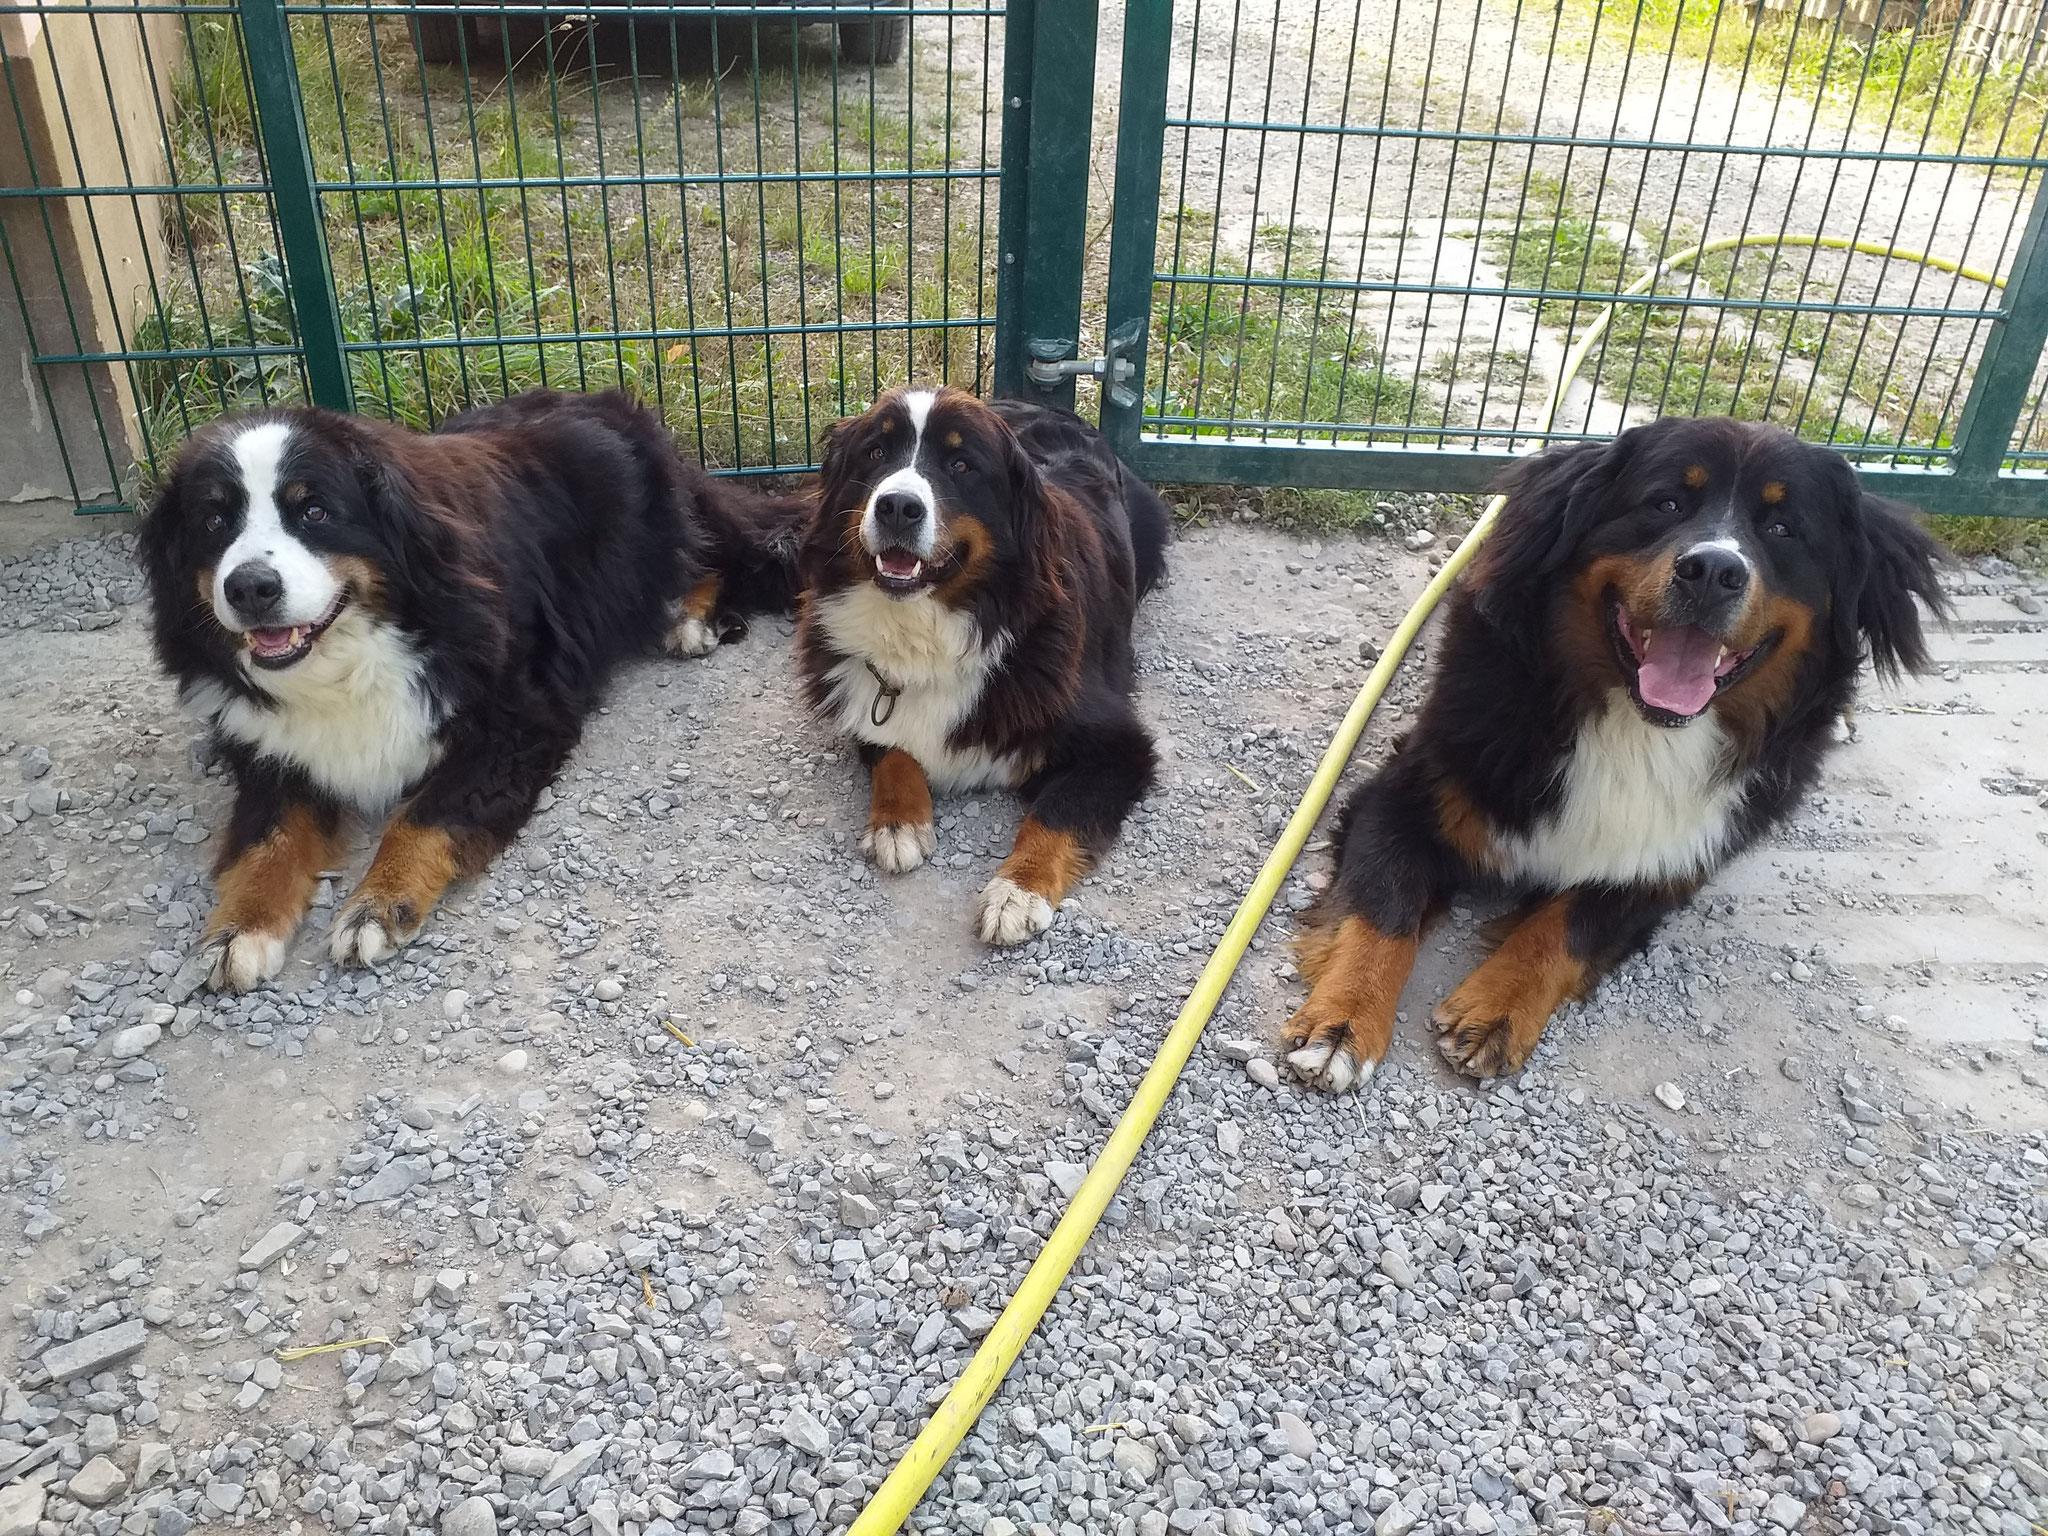 Drei Generationen, v.l.n.r. Irma (Oma), Alisia (Mutter), Django (Sohn)